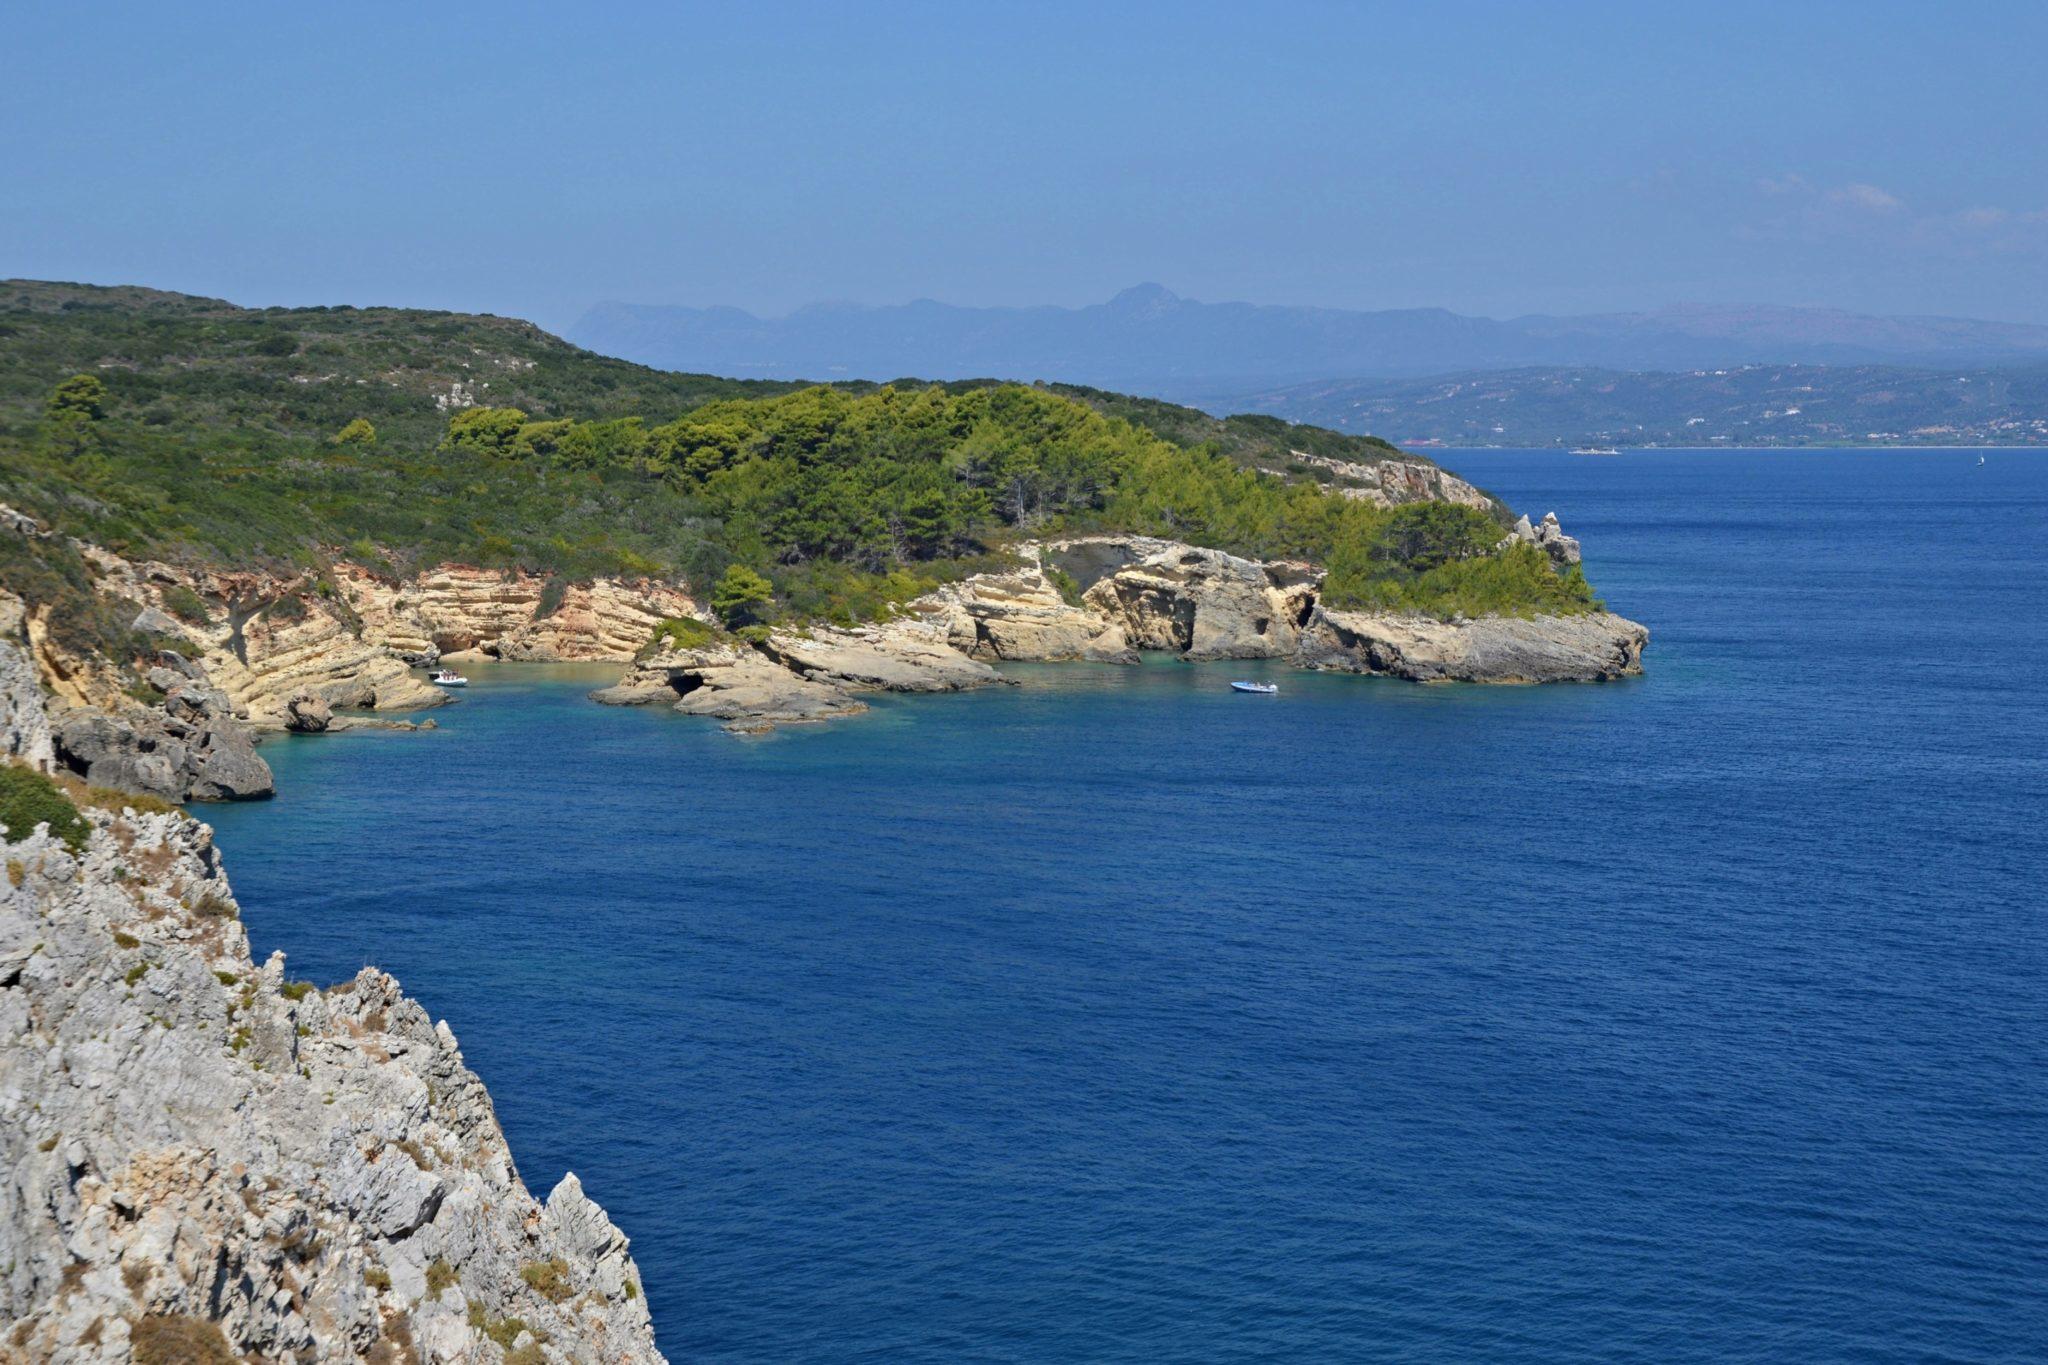 Tsichli Mpampa and the French memorial. Boat trip around the Navarino Bay, Messinia, Greece